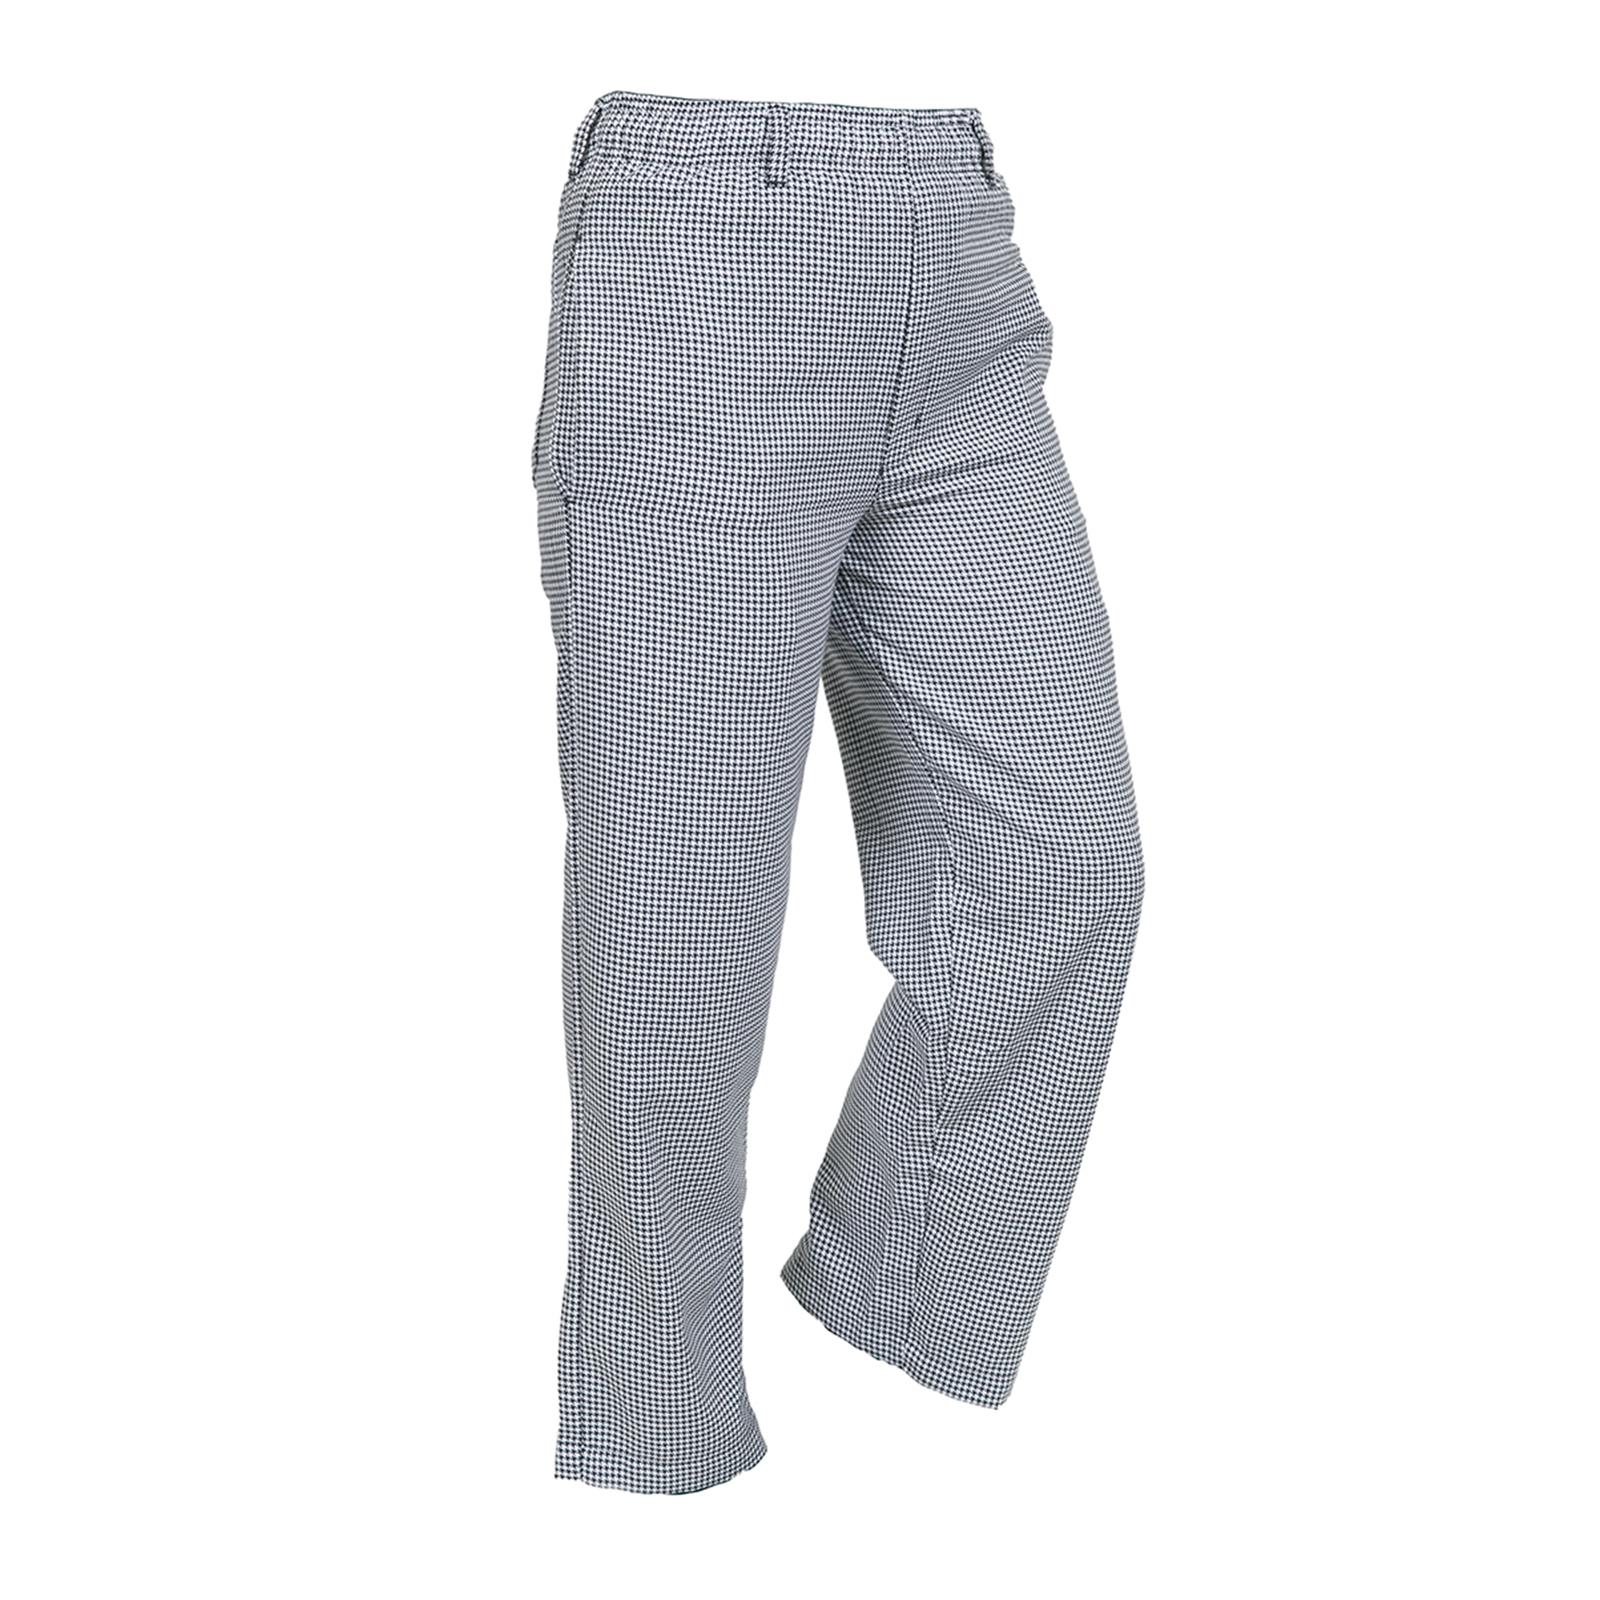 Mercer Culinary M61050HT2X chef's pants